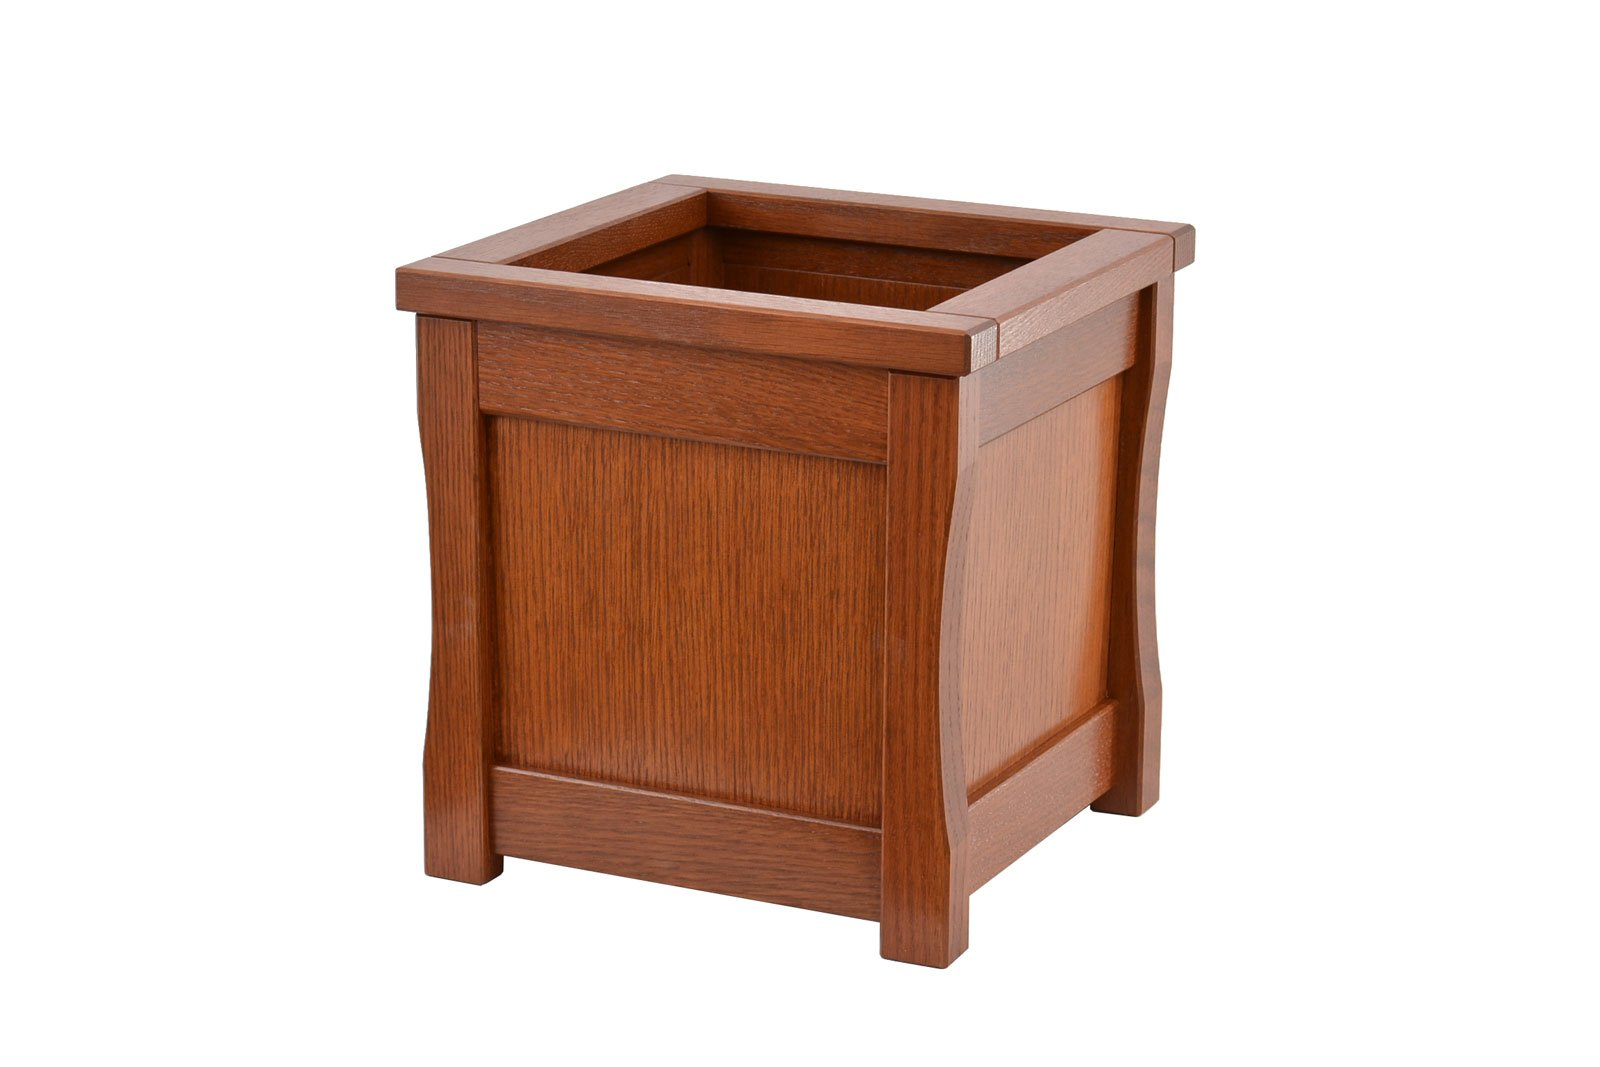 Medium wooden trash can. Mission style. Oak. TE-823